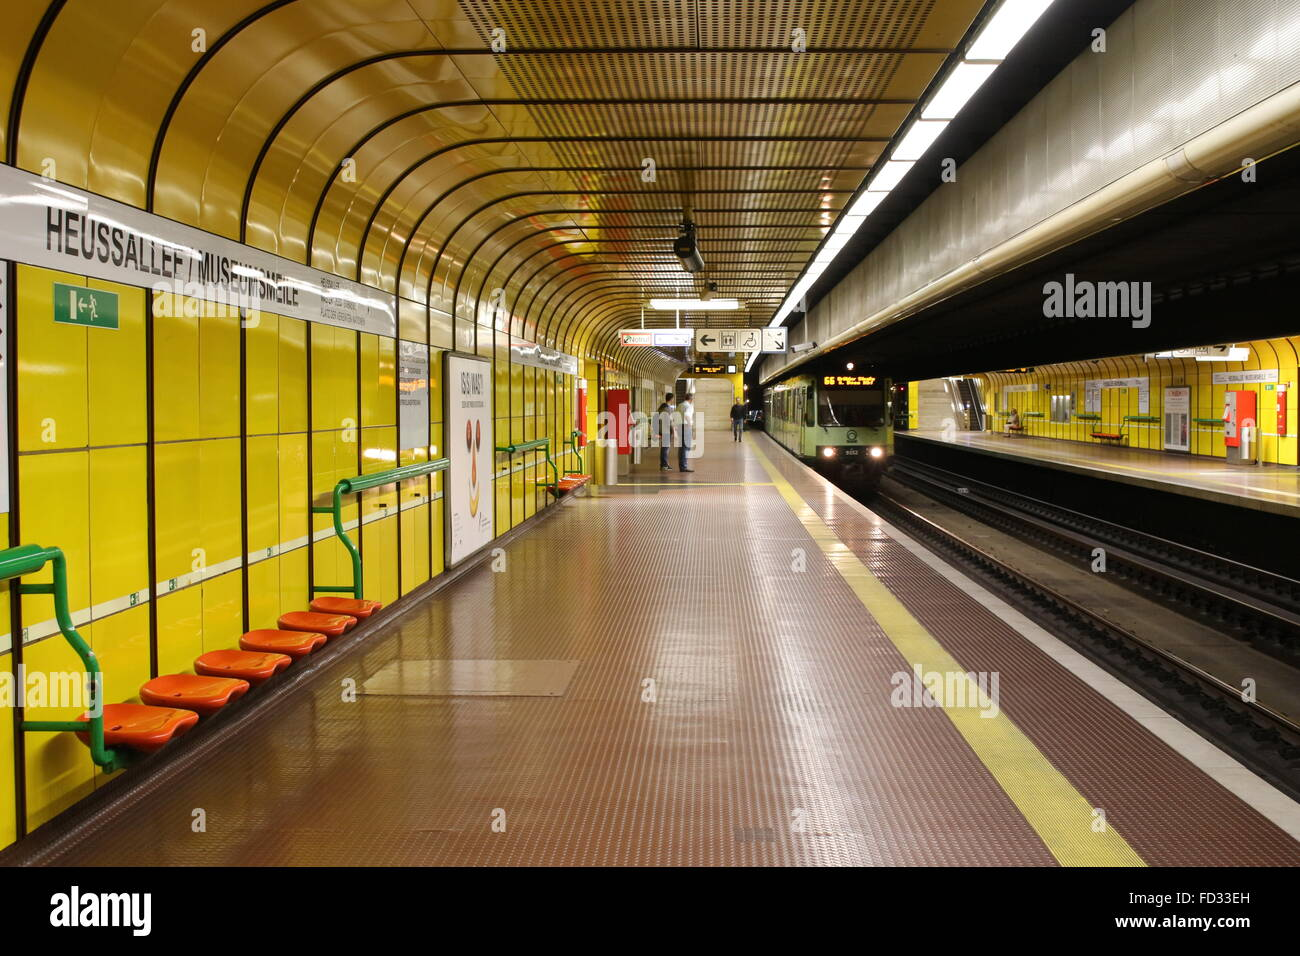 Bonn, Germany, underground station 'Heussallee' - Stock Image